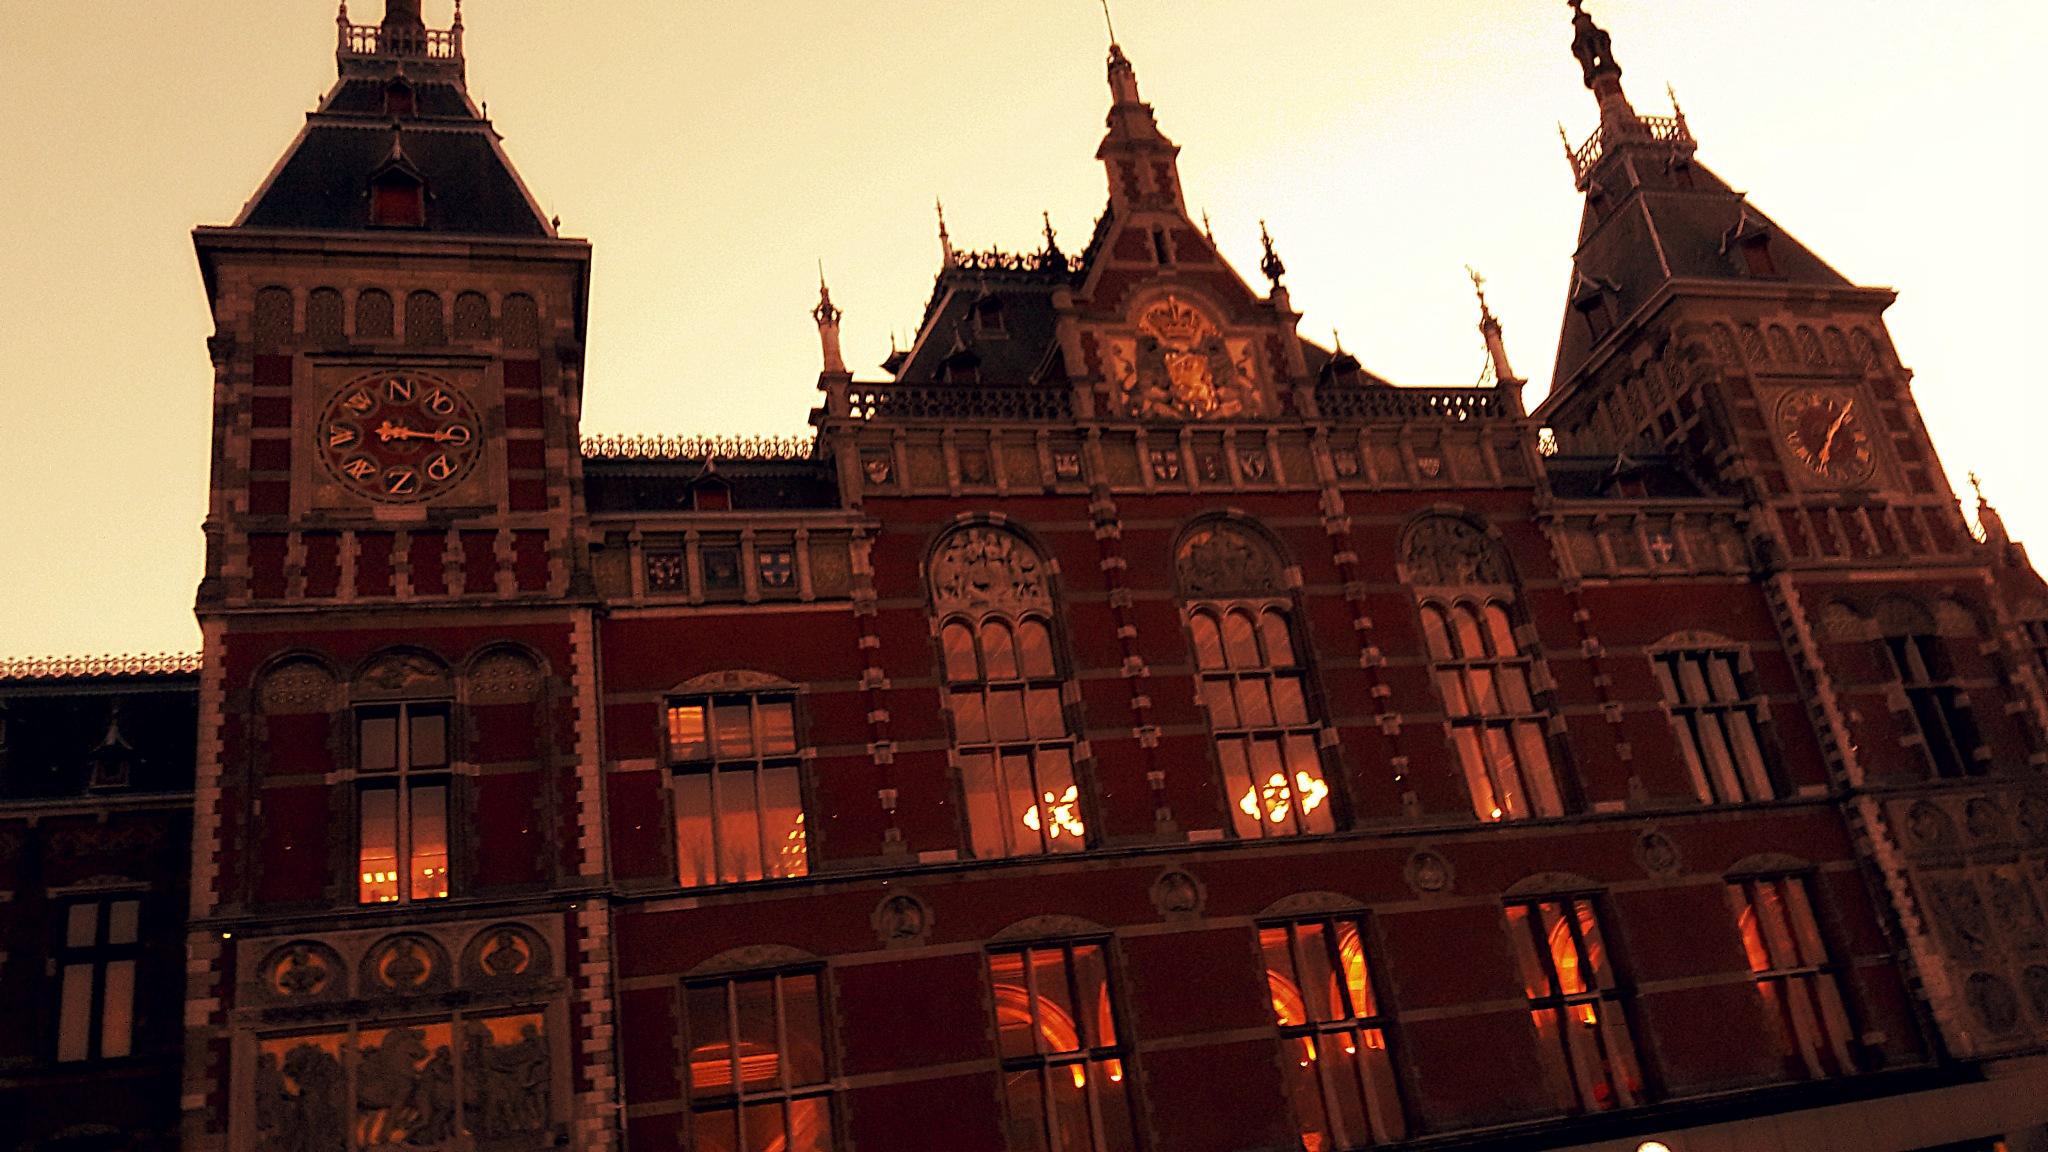 Amsterdam Central station by Danny Korndorffer